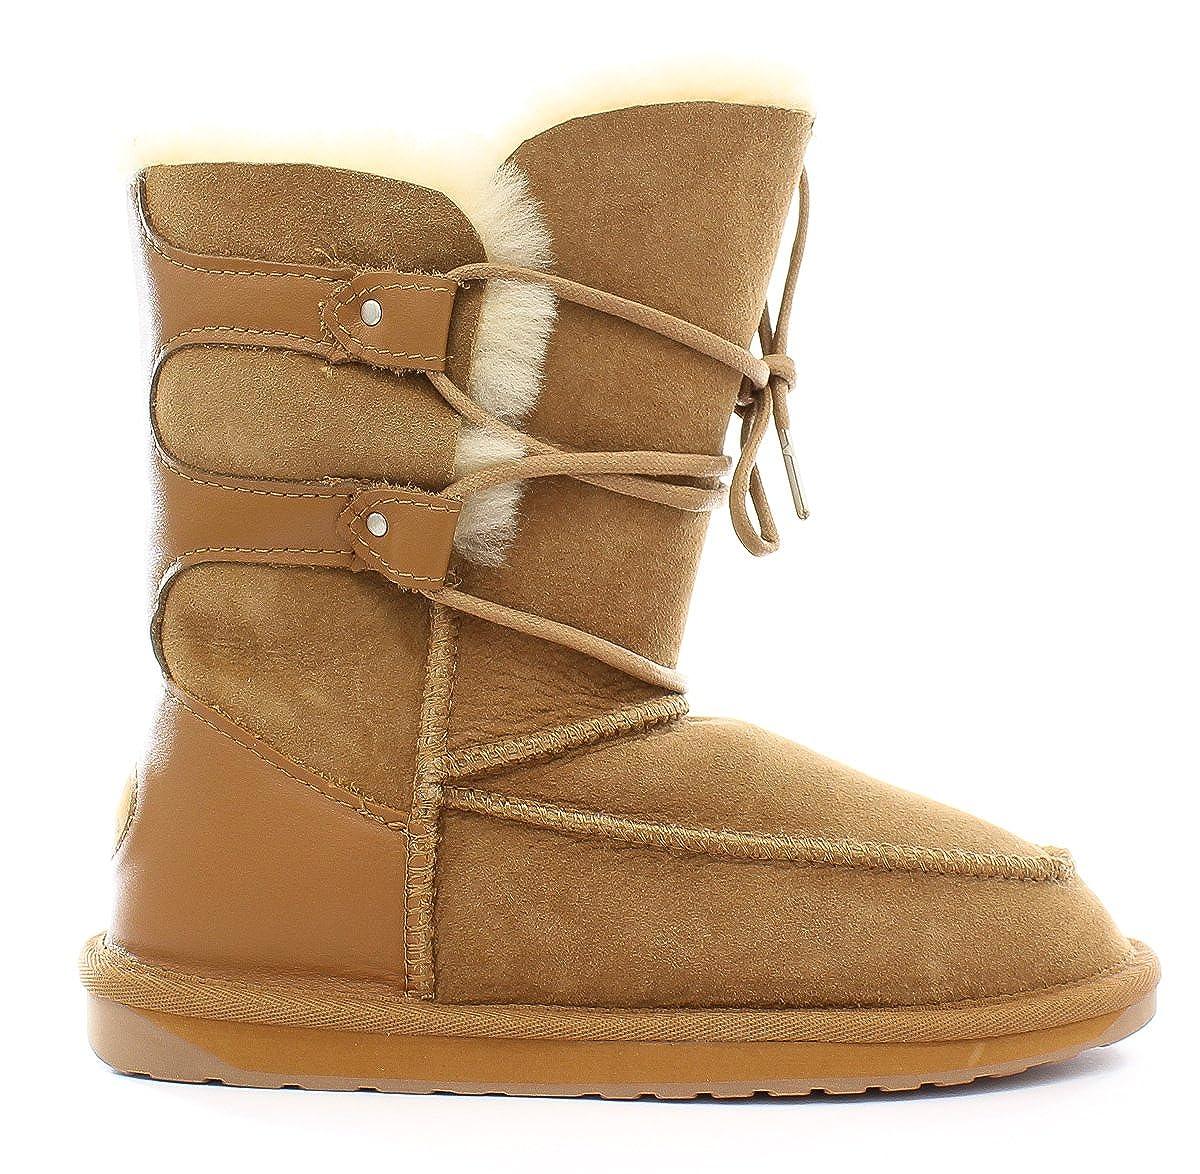 3dcb028a0cf Emu Sheepskin Boots 11263 Delegate Chestnut: Amazon.co.uk: Shoes & Bags